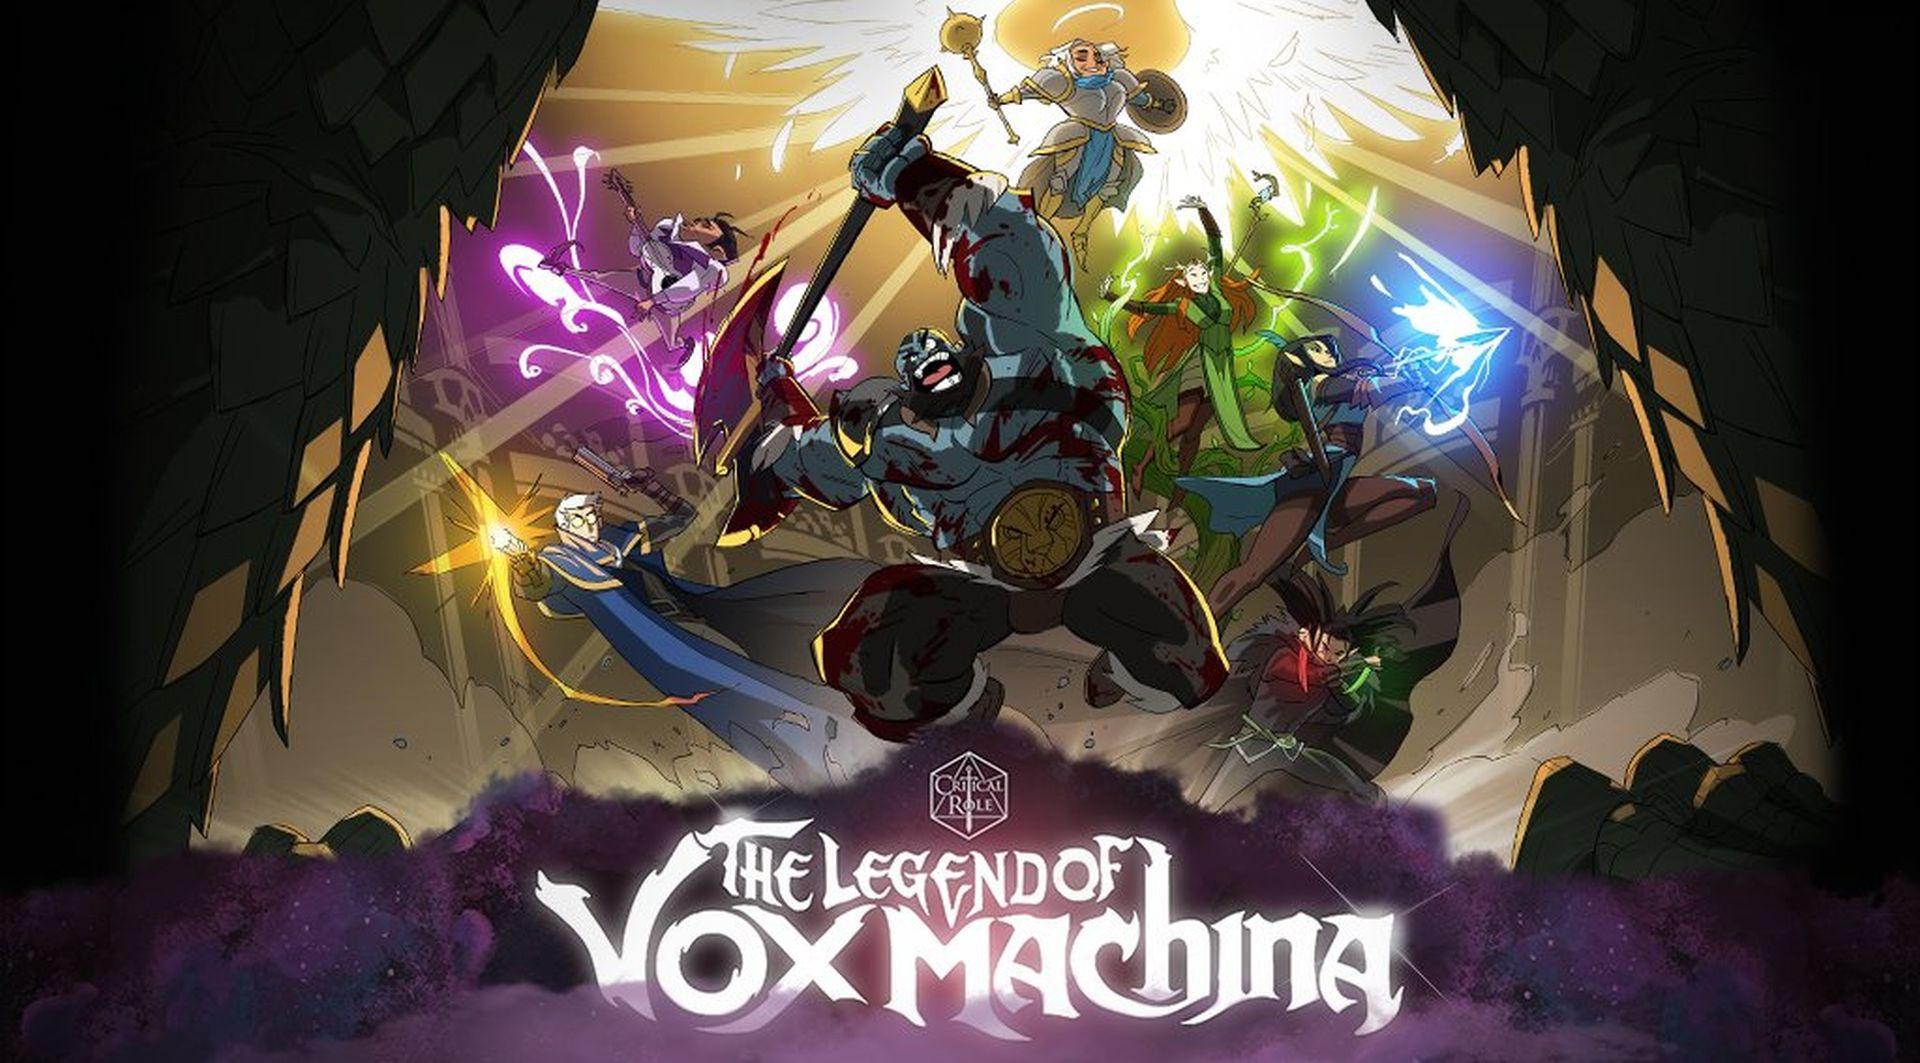 legend_vox_machina2.jpg